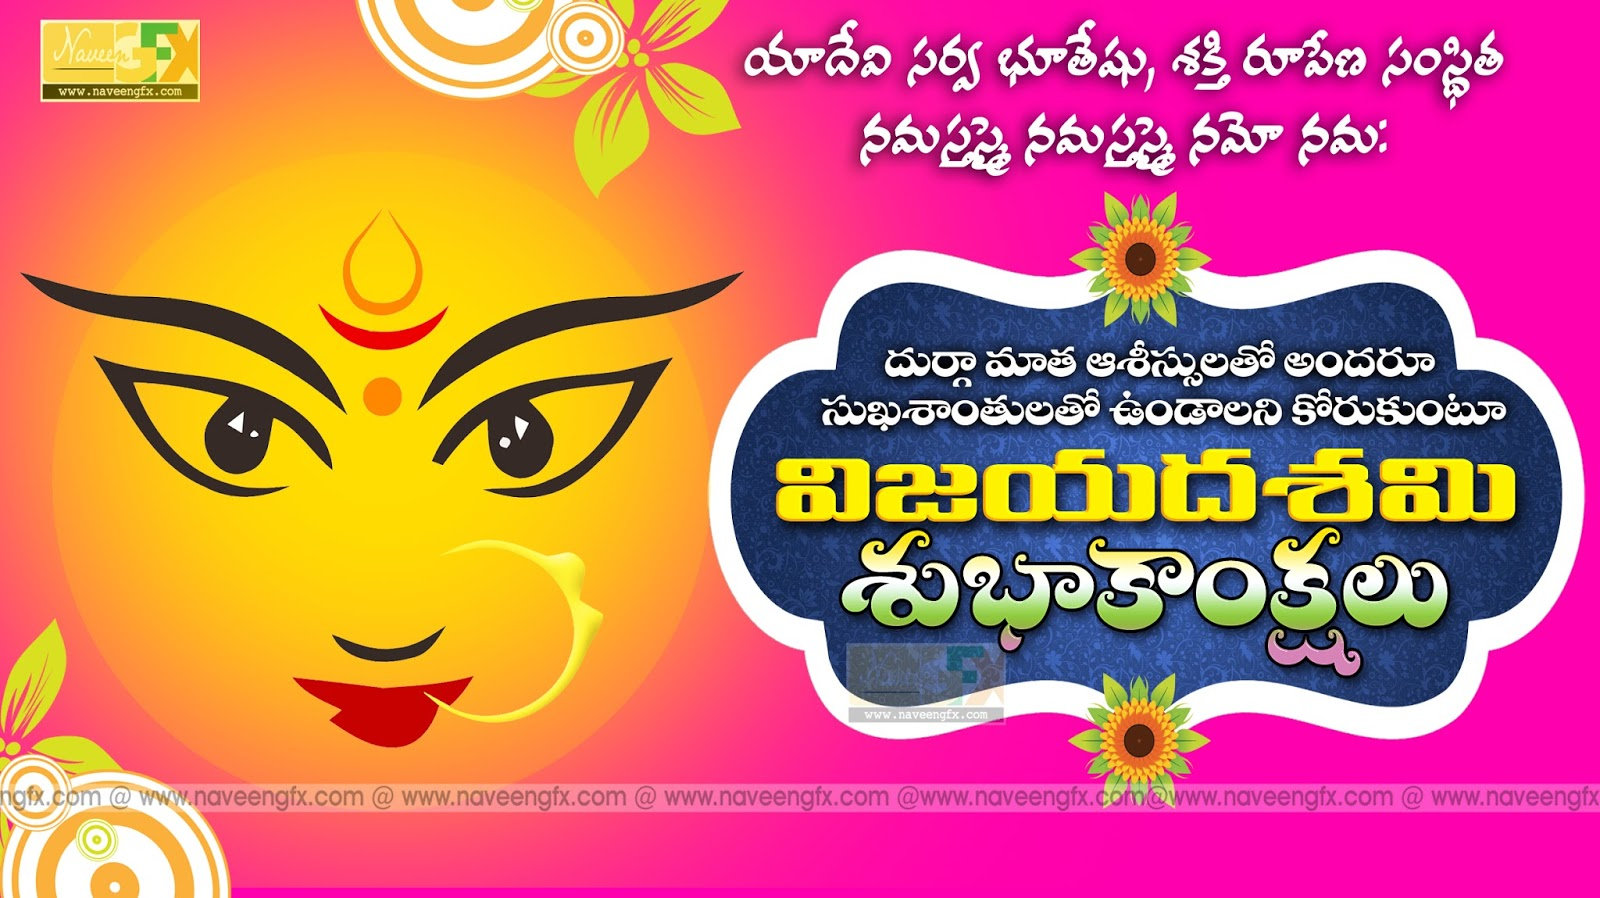 Happy dussehra telugu quotes and greetings hd wallpapers naveengfx happy vijaya dashami nice telugu quotes and greetings for facebook m4hsunfo